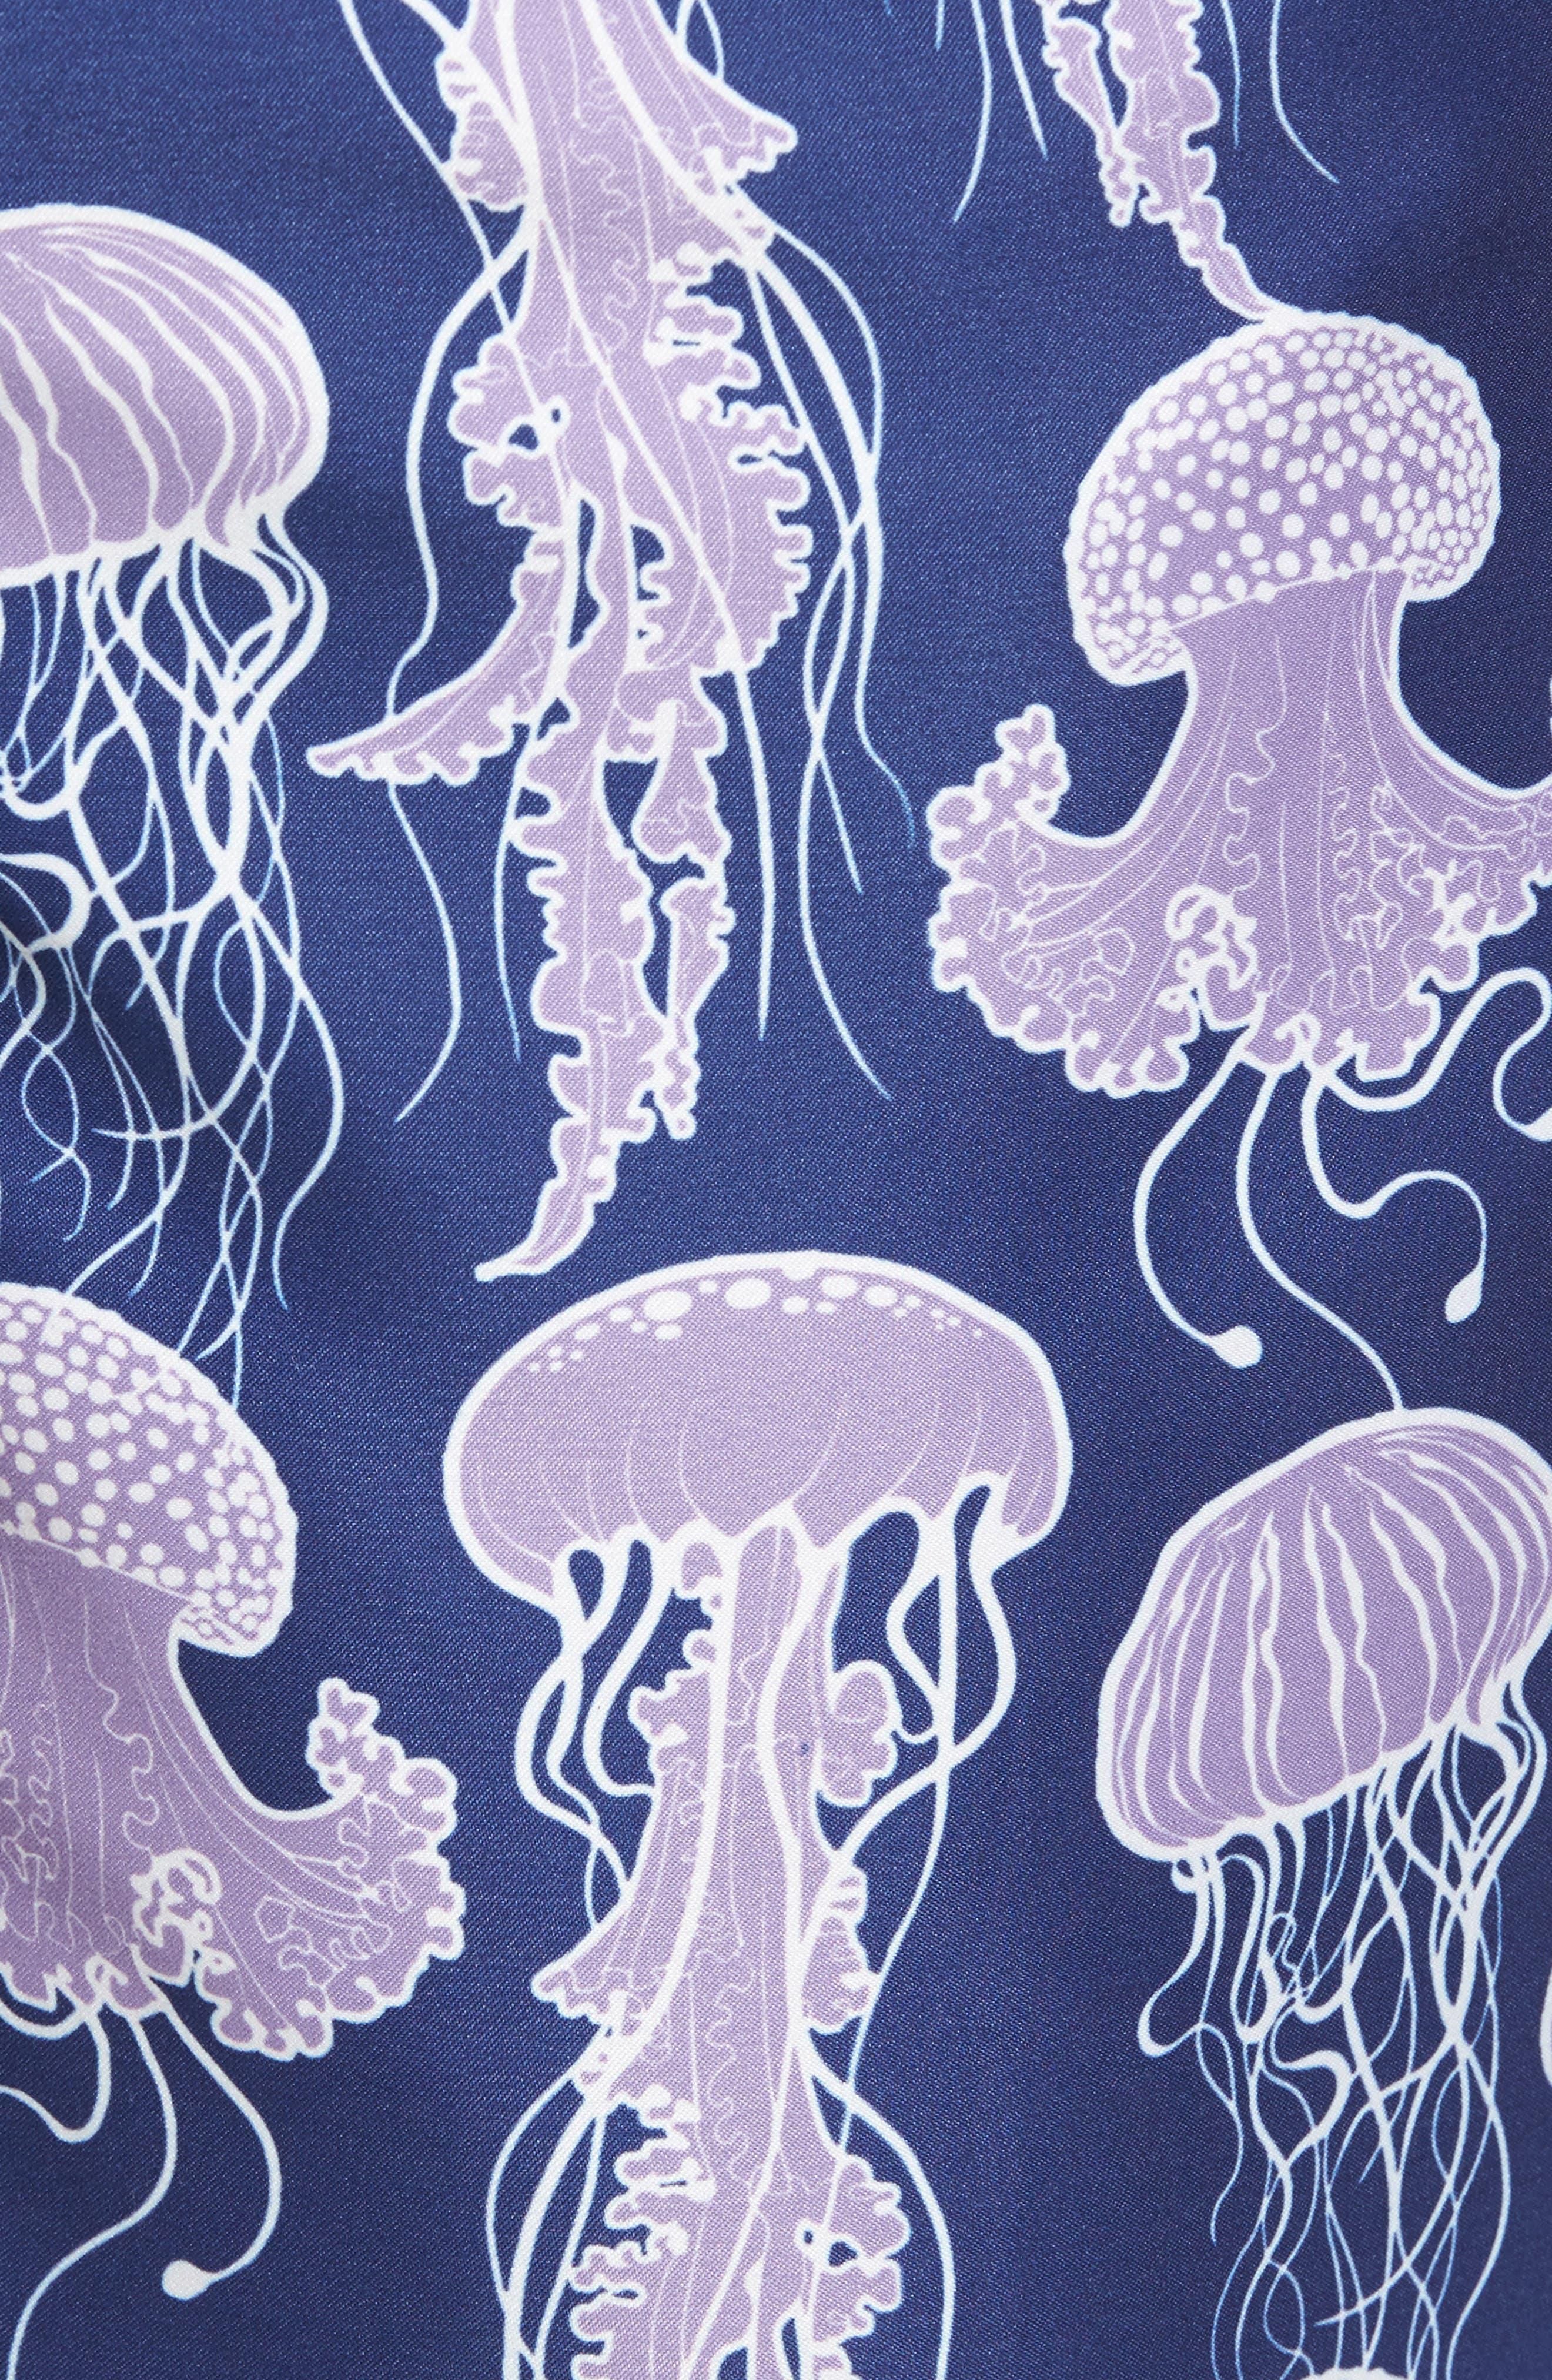 Jelly Fish Swim Trunks,                             Alternate thumbnail 5, color,                             400